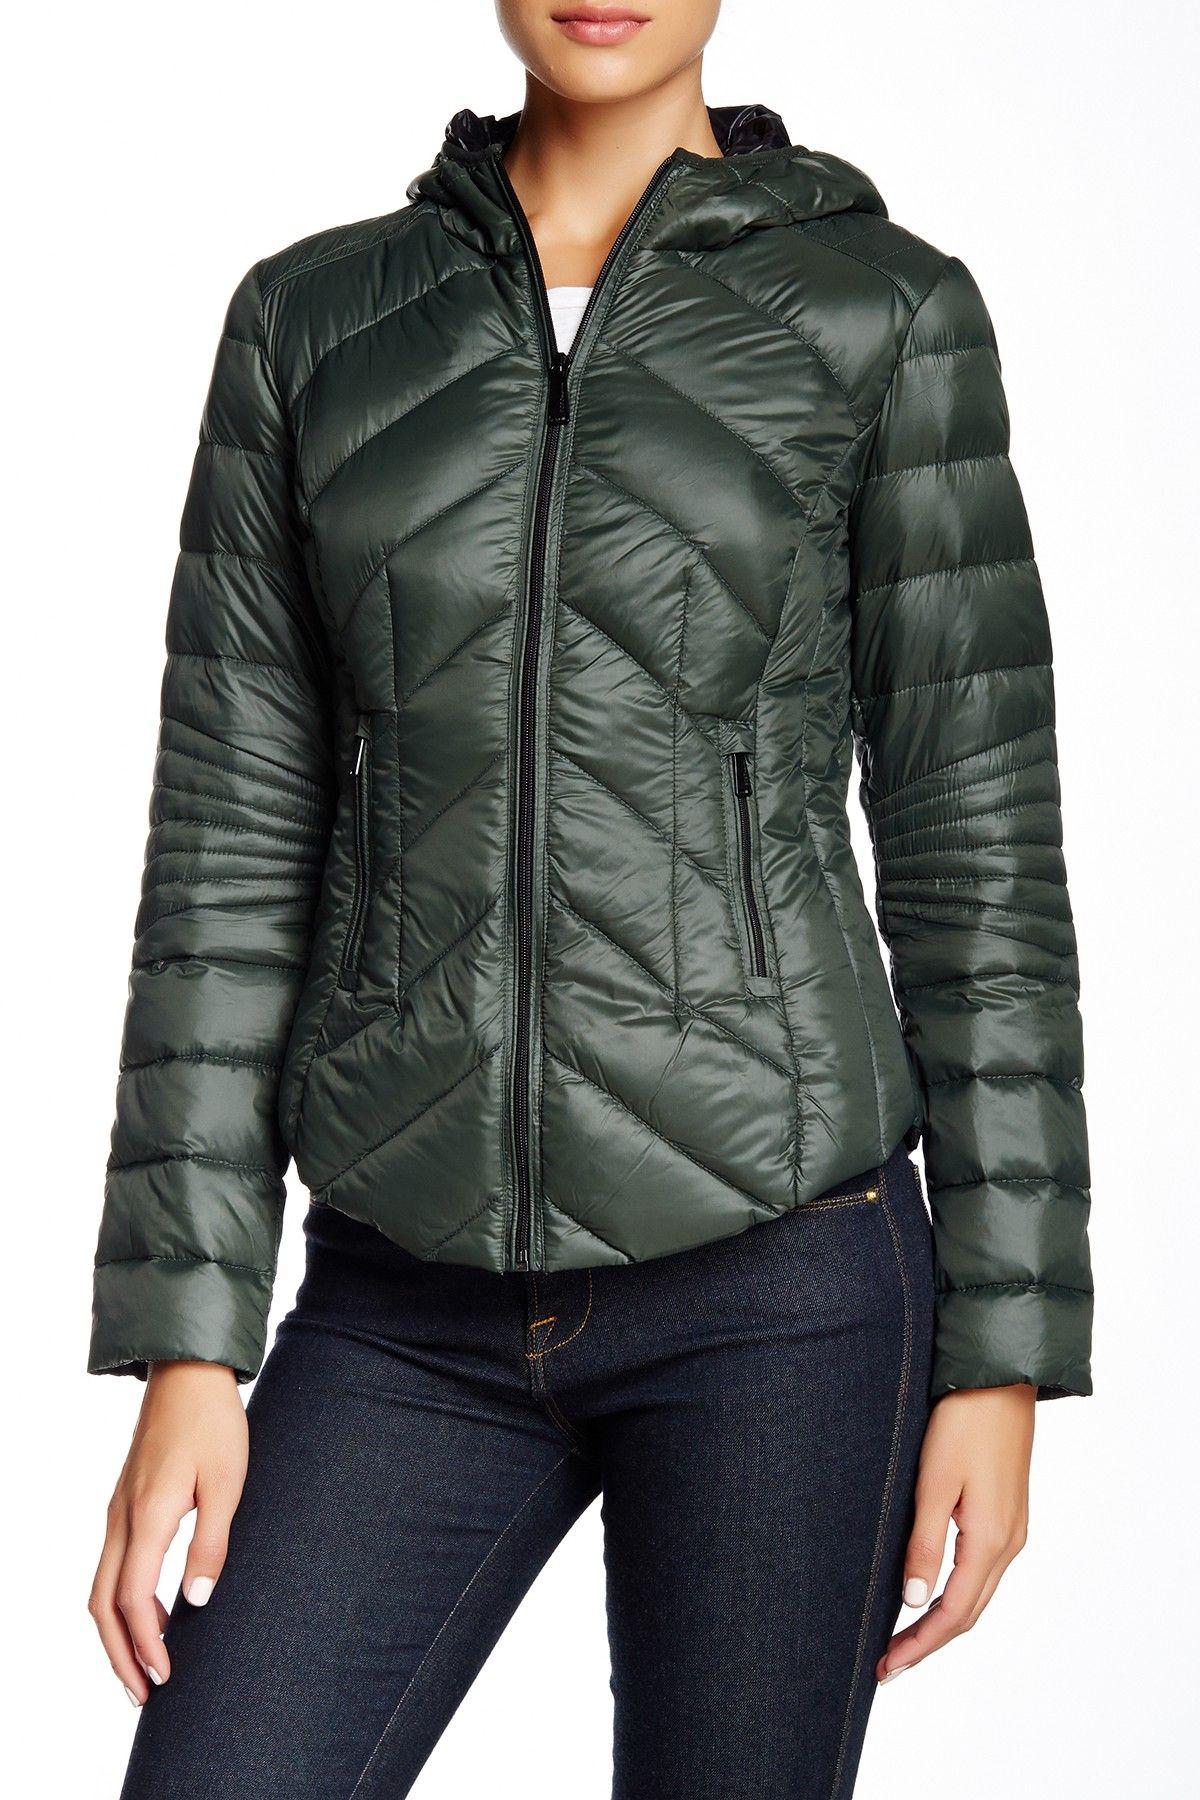 Bcbgeneration Missy Short Hooded Packable Jacket Nordstrom Rack Packable Jacket Jackets Women S Puffer [ 1800 x 1200 Pixel ]